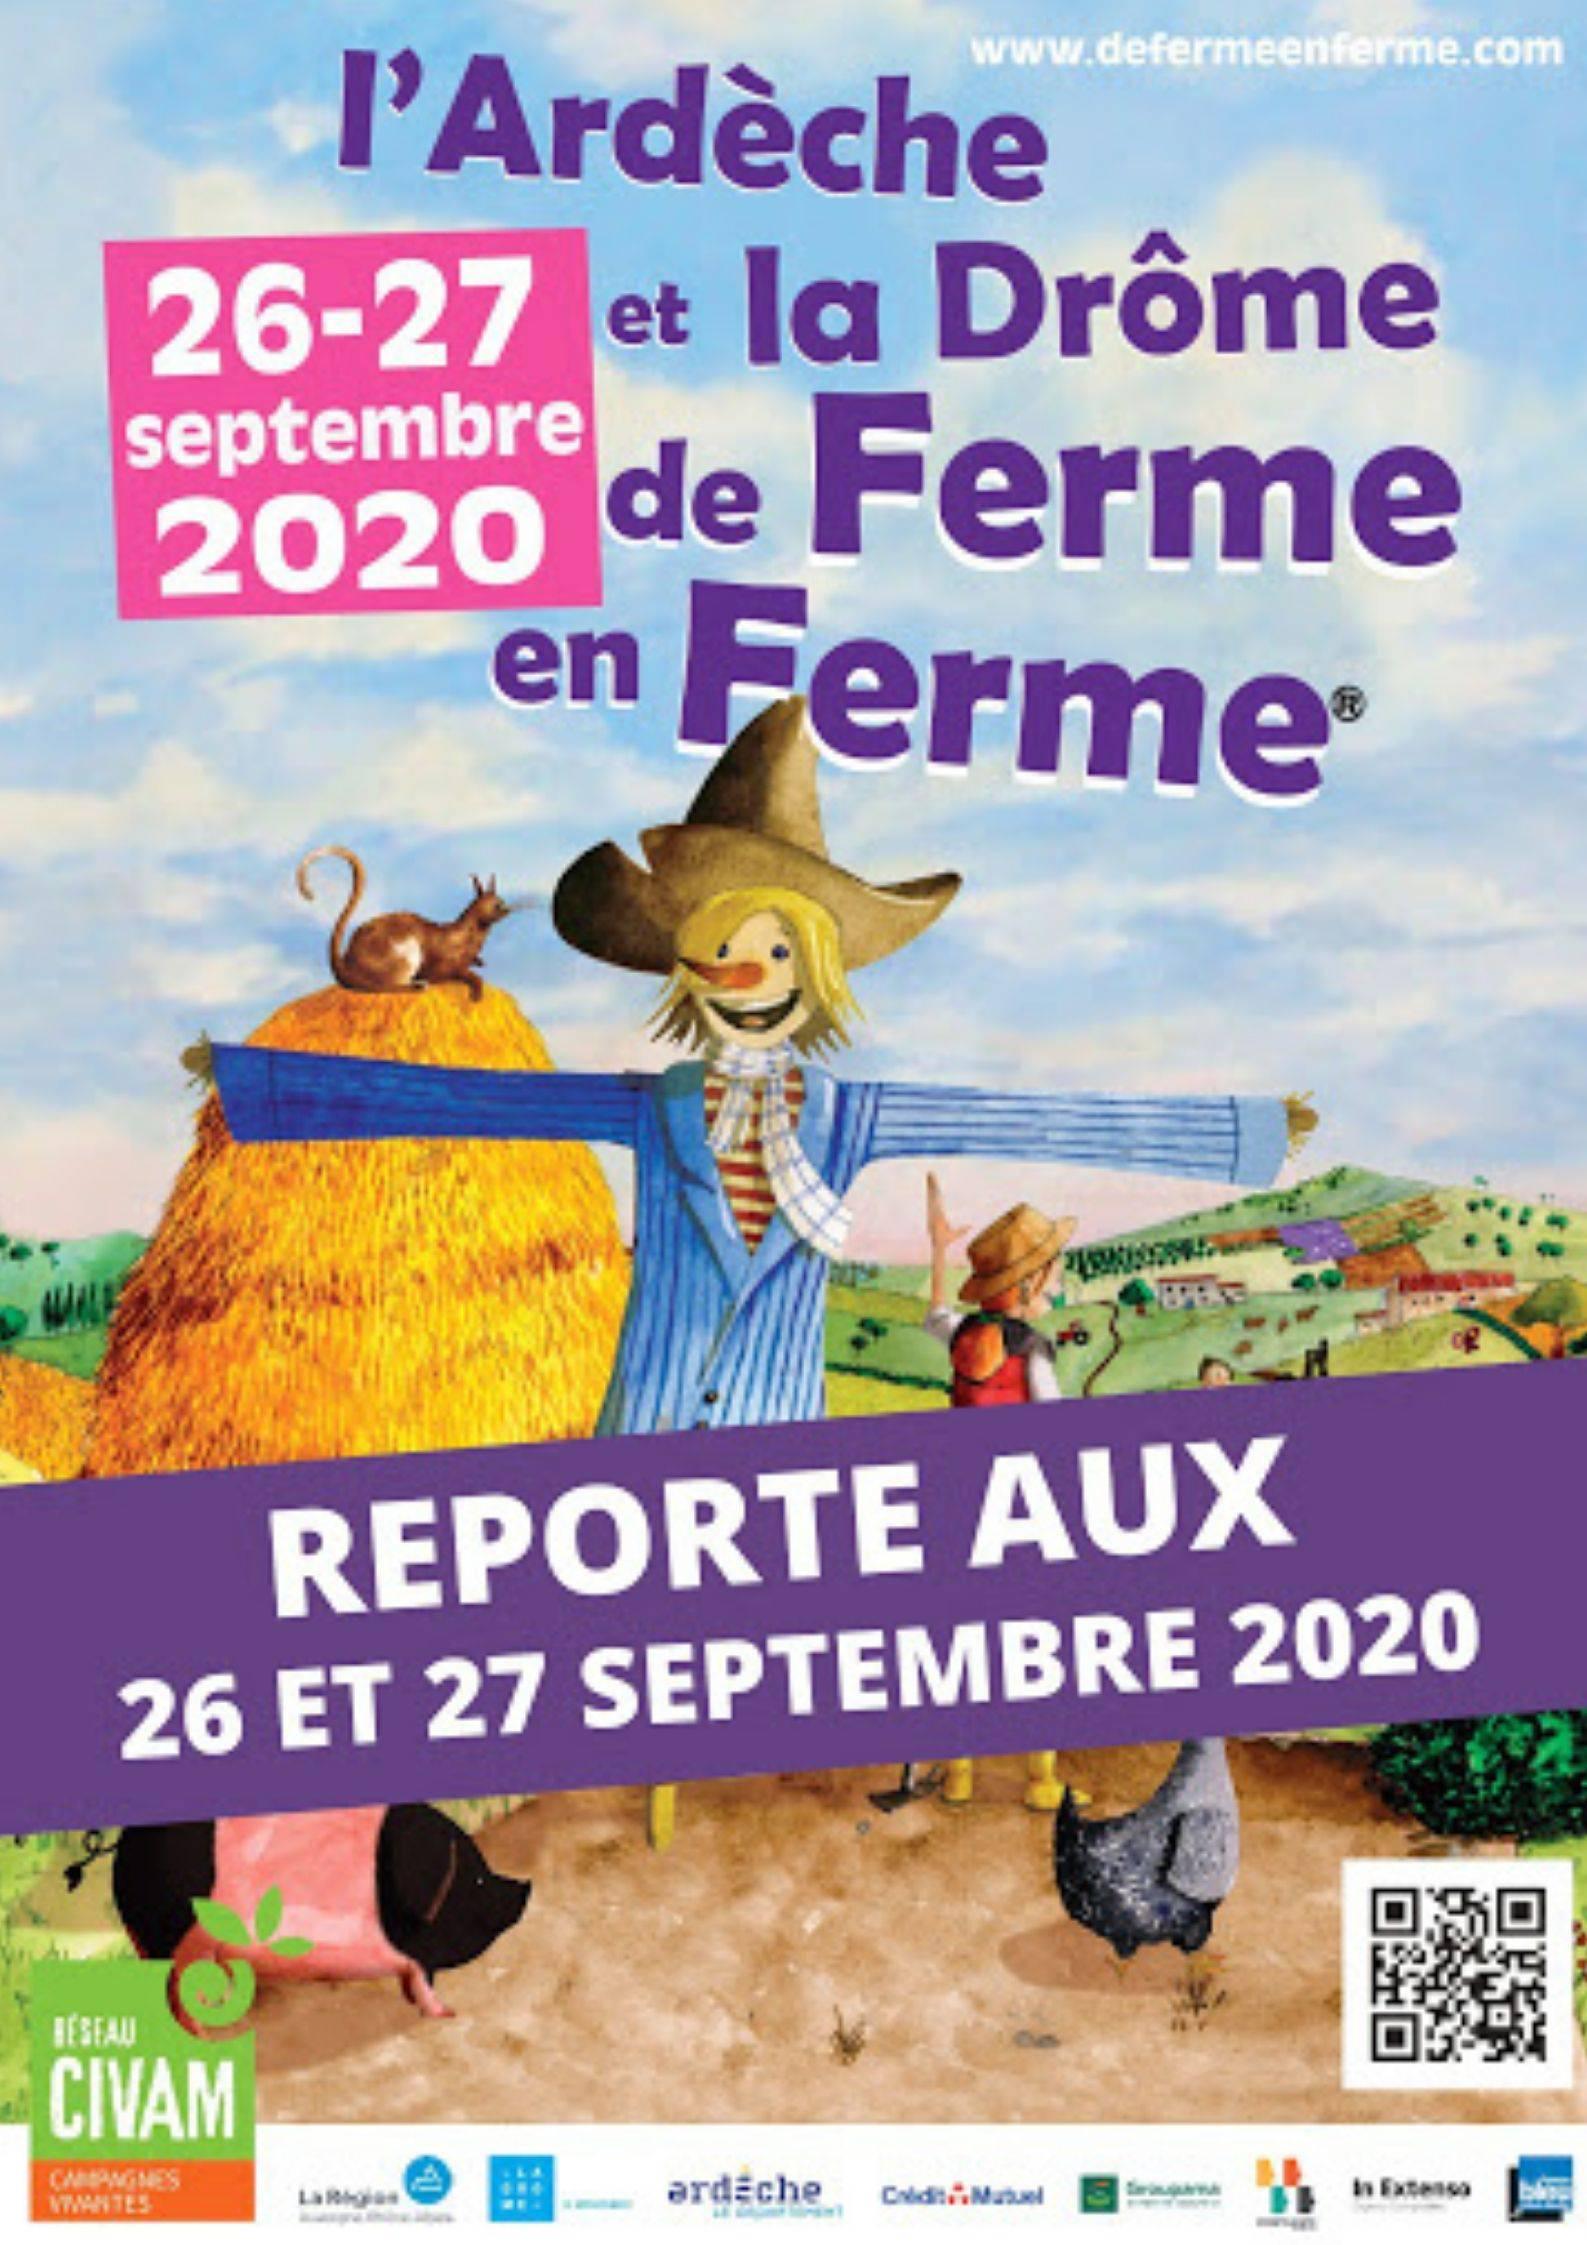 Affiche de ferme en ferme Drôme Ardèche